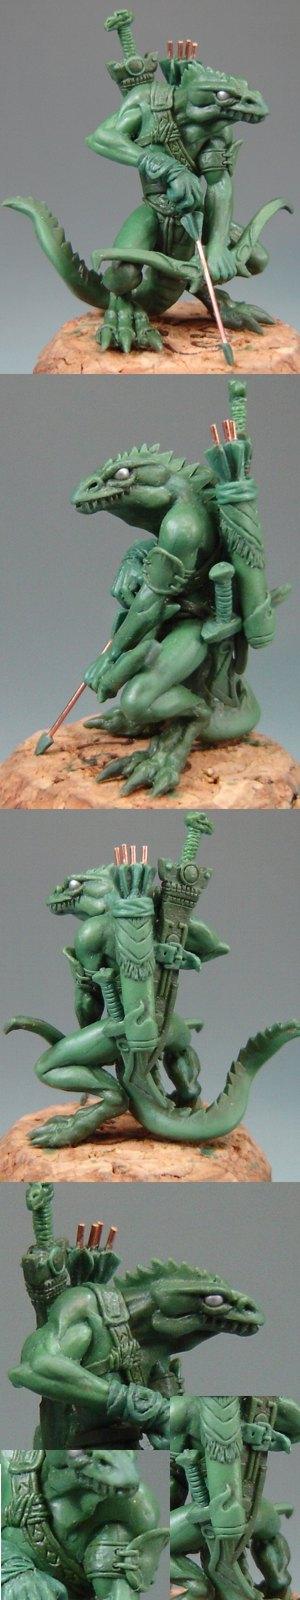 Zygore Lizard Man